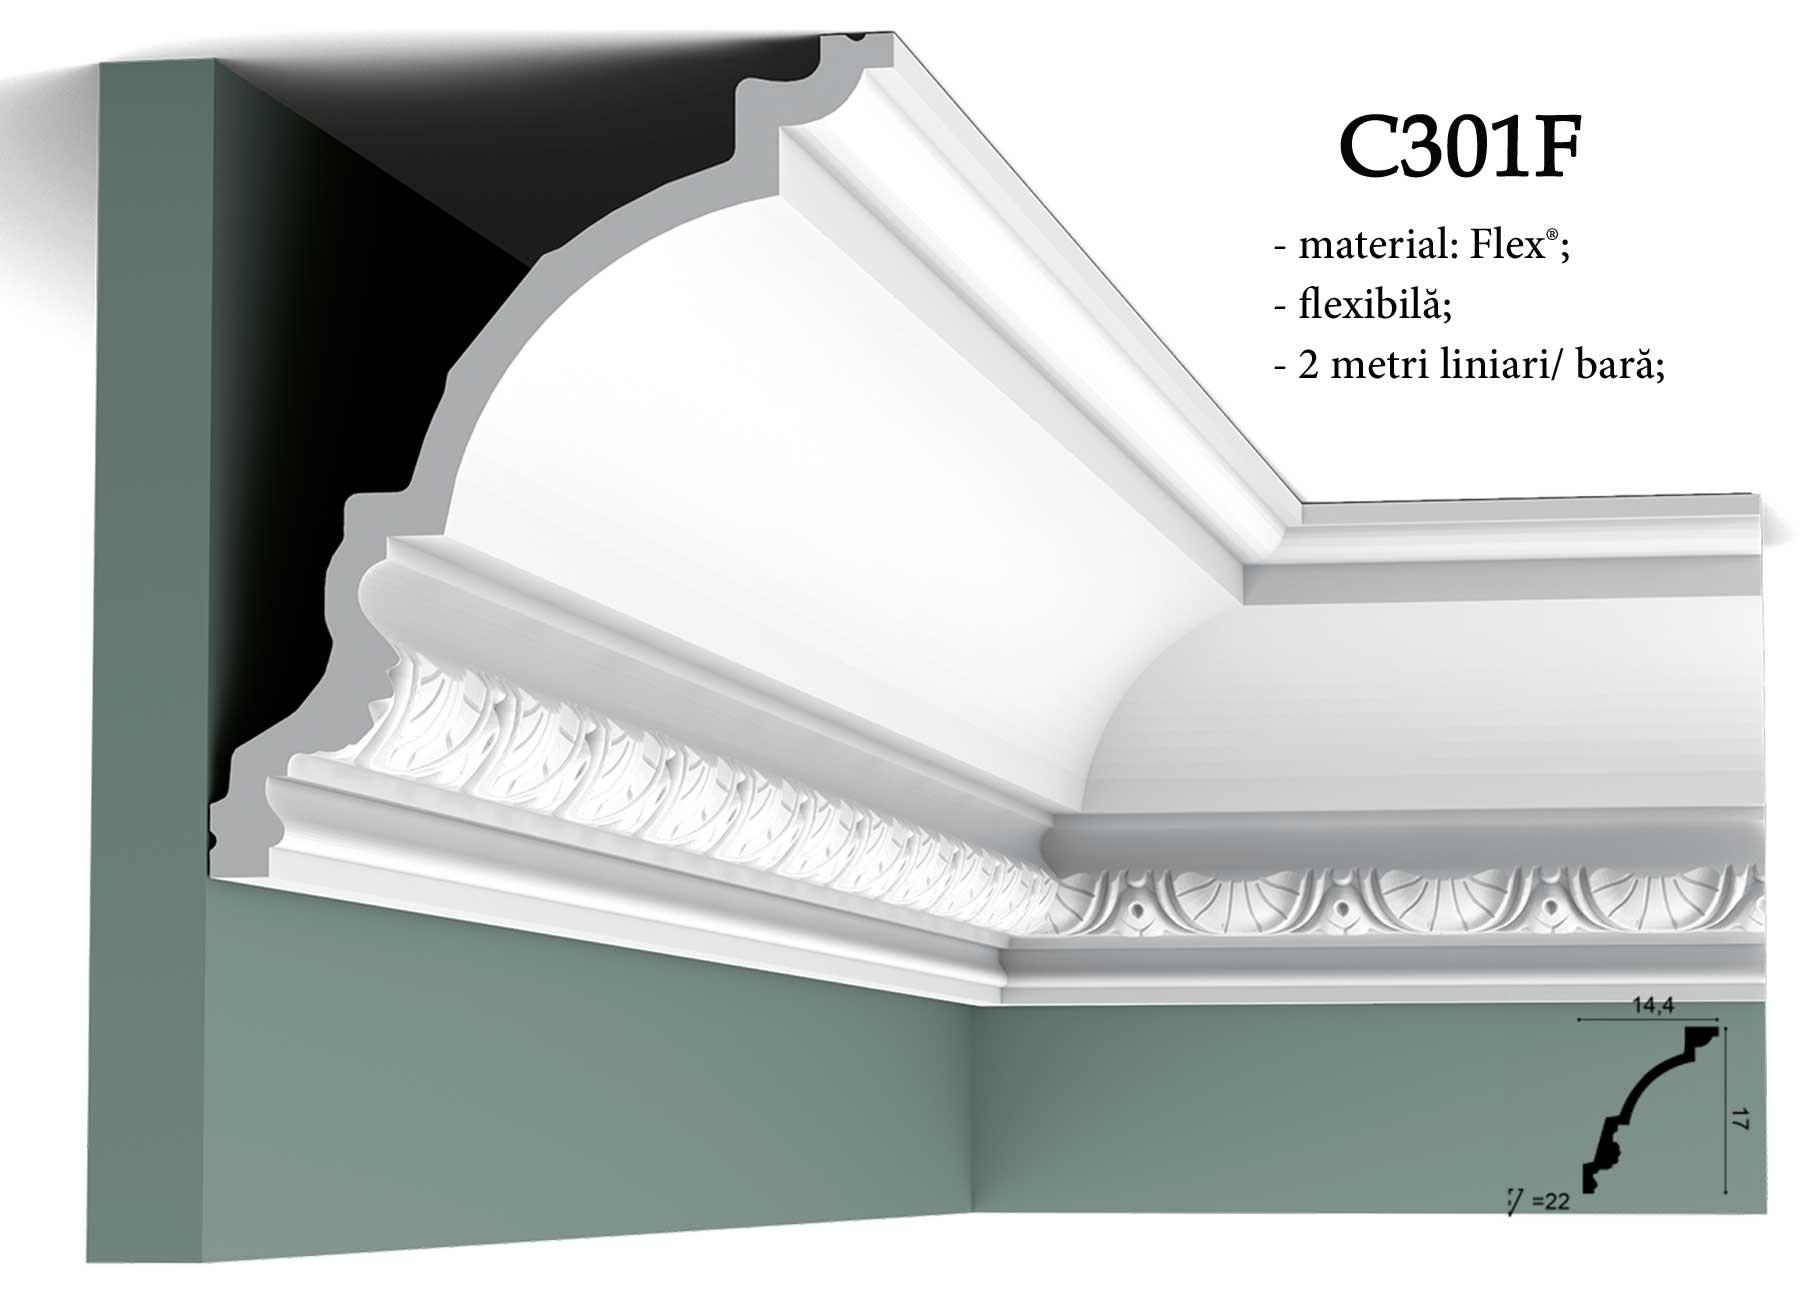 Cornisa flexibila pentru tavan Orac Decor C301F